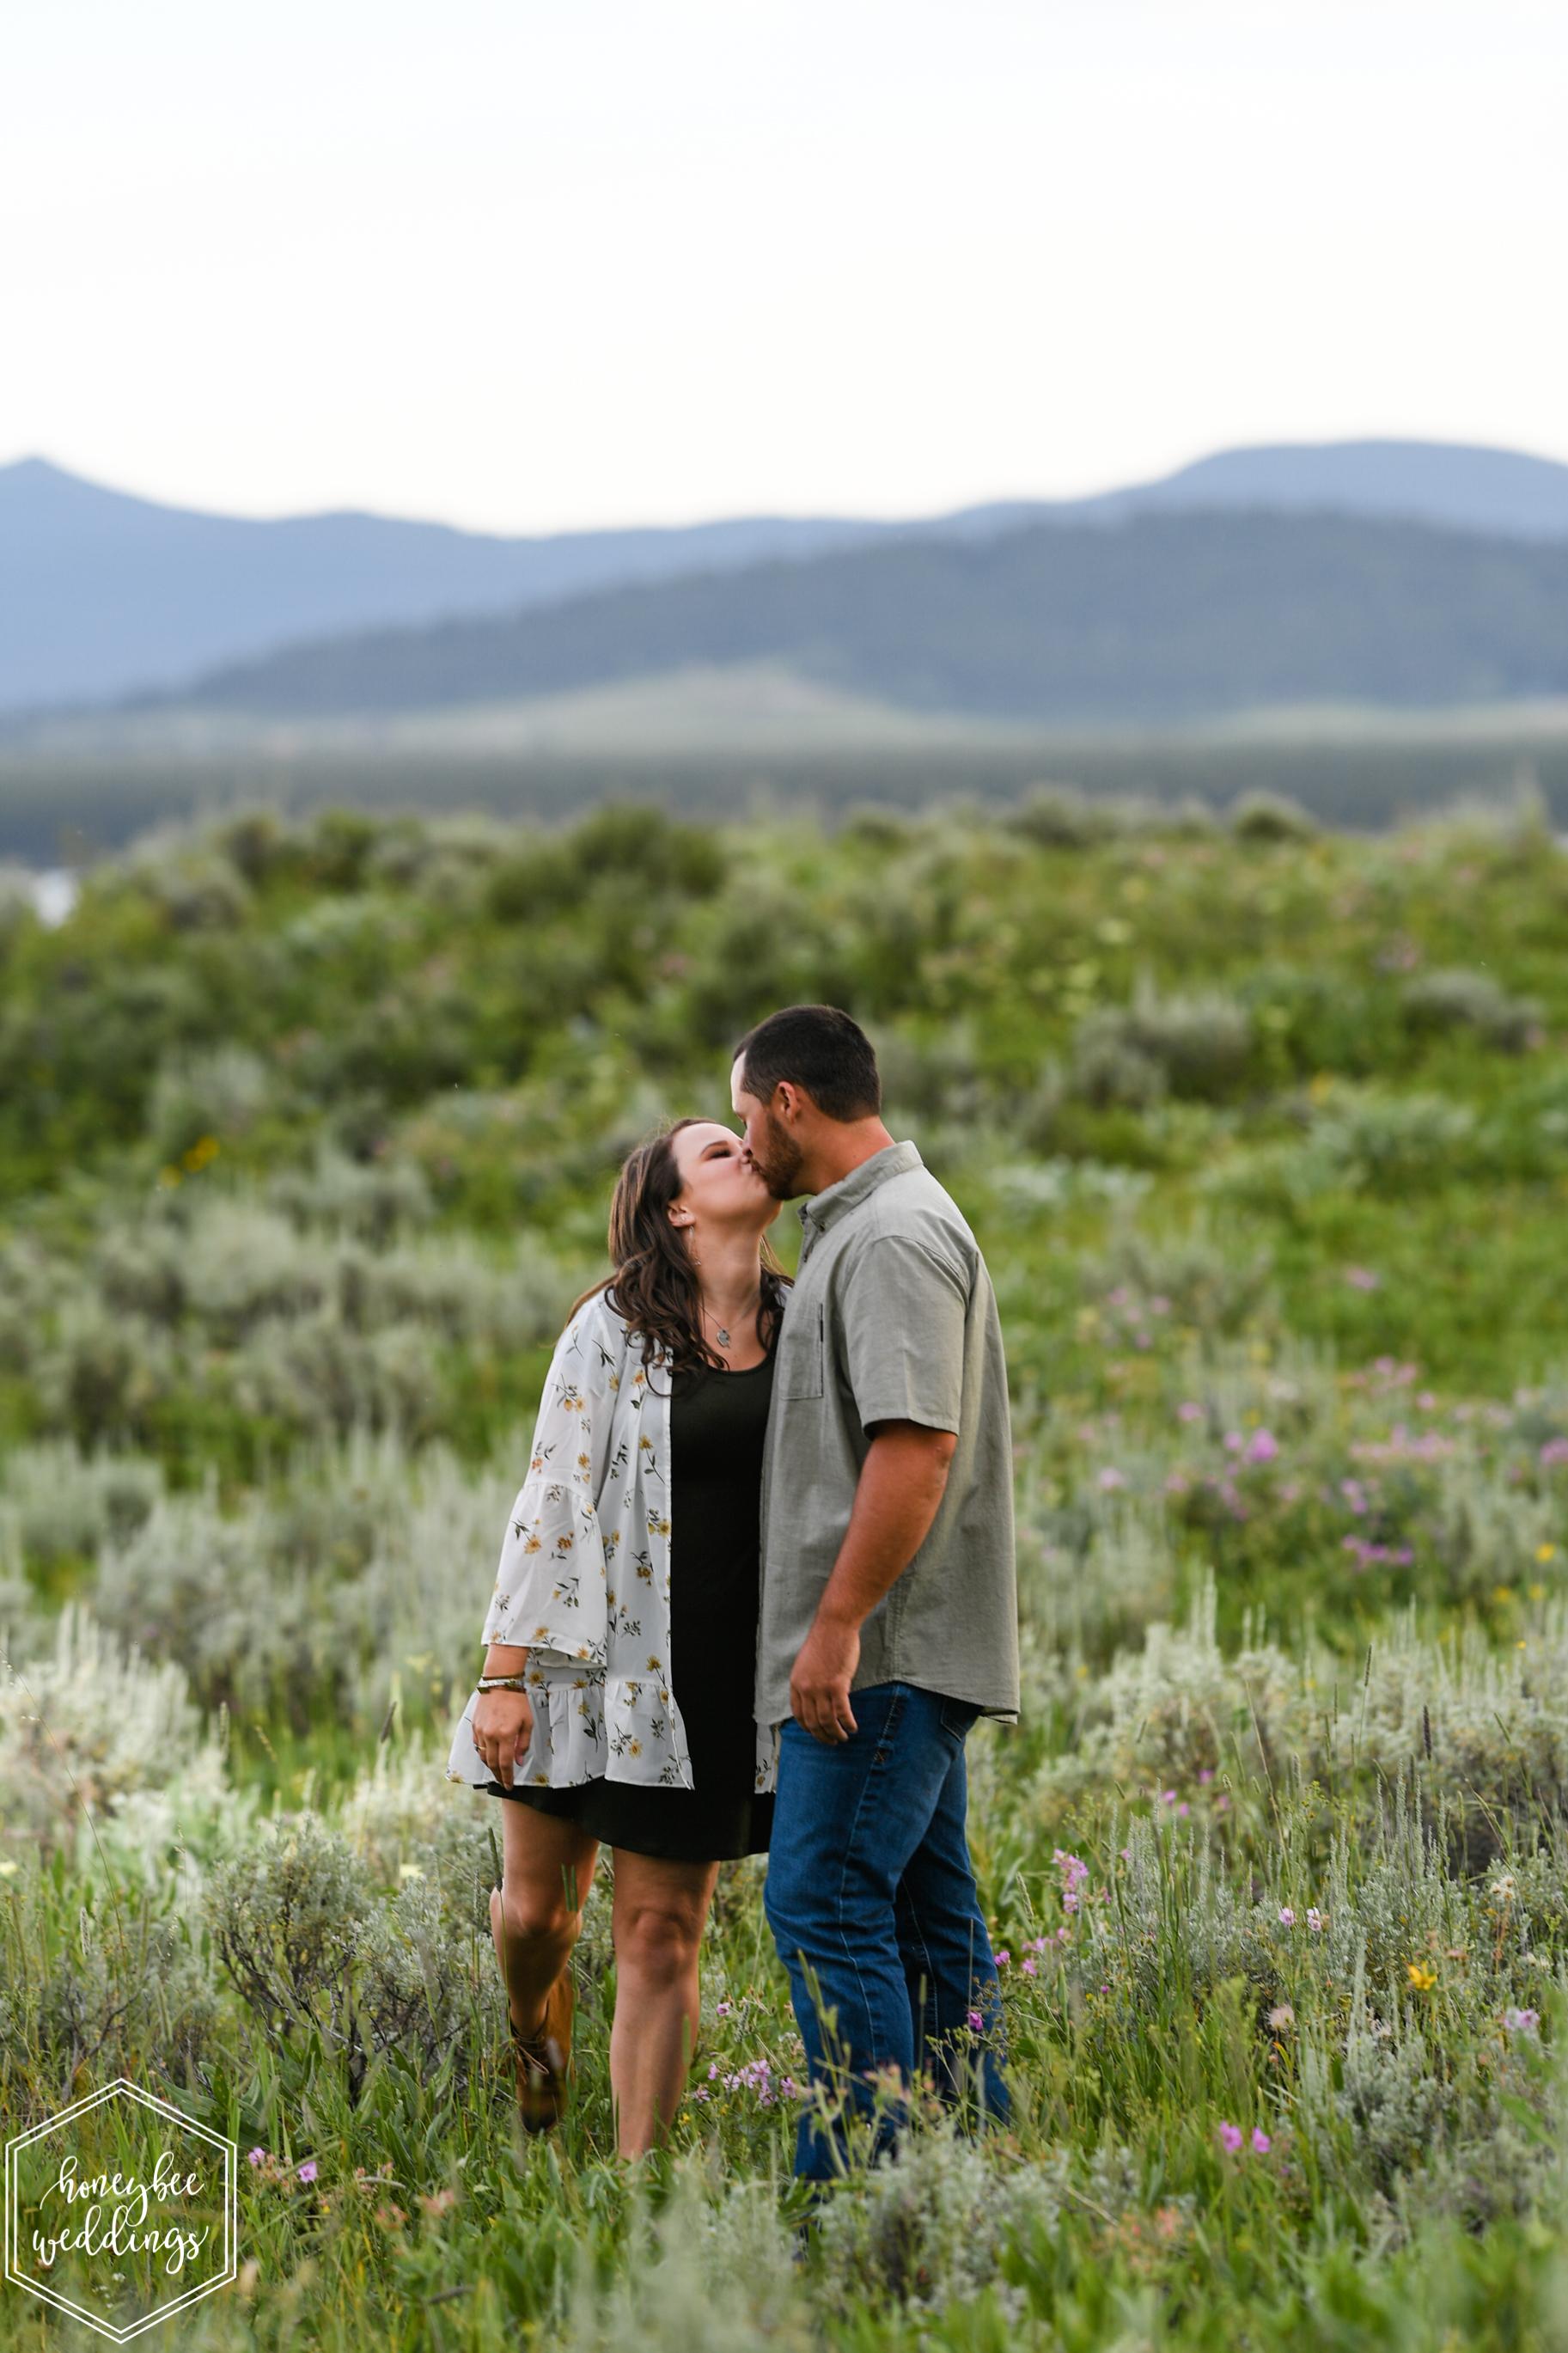 029Yellowstone National Park Wedding Photographer_Montana Engagement Session_Kelsie & DJ_July 24, 2019-81.jpg